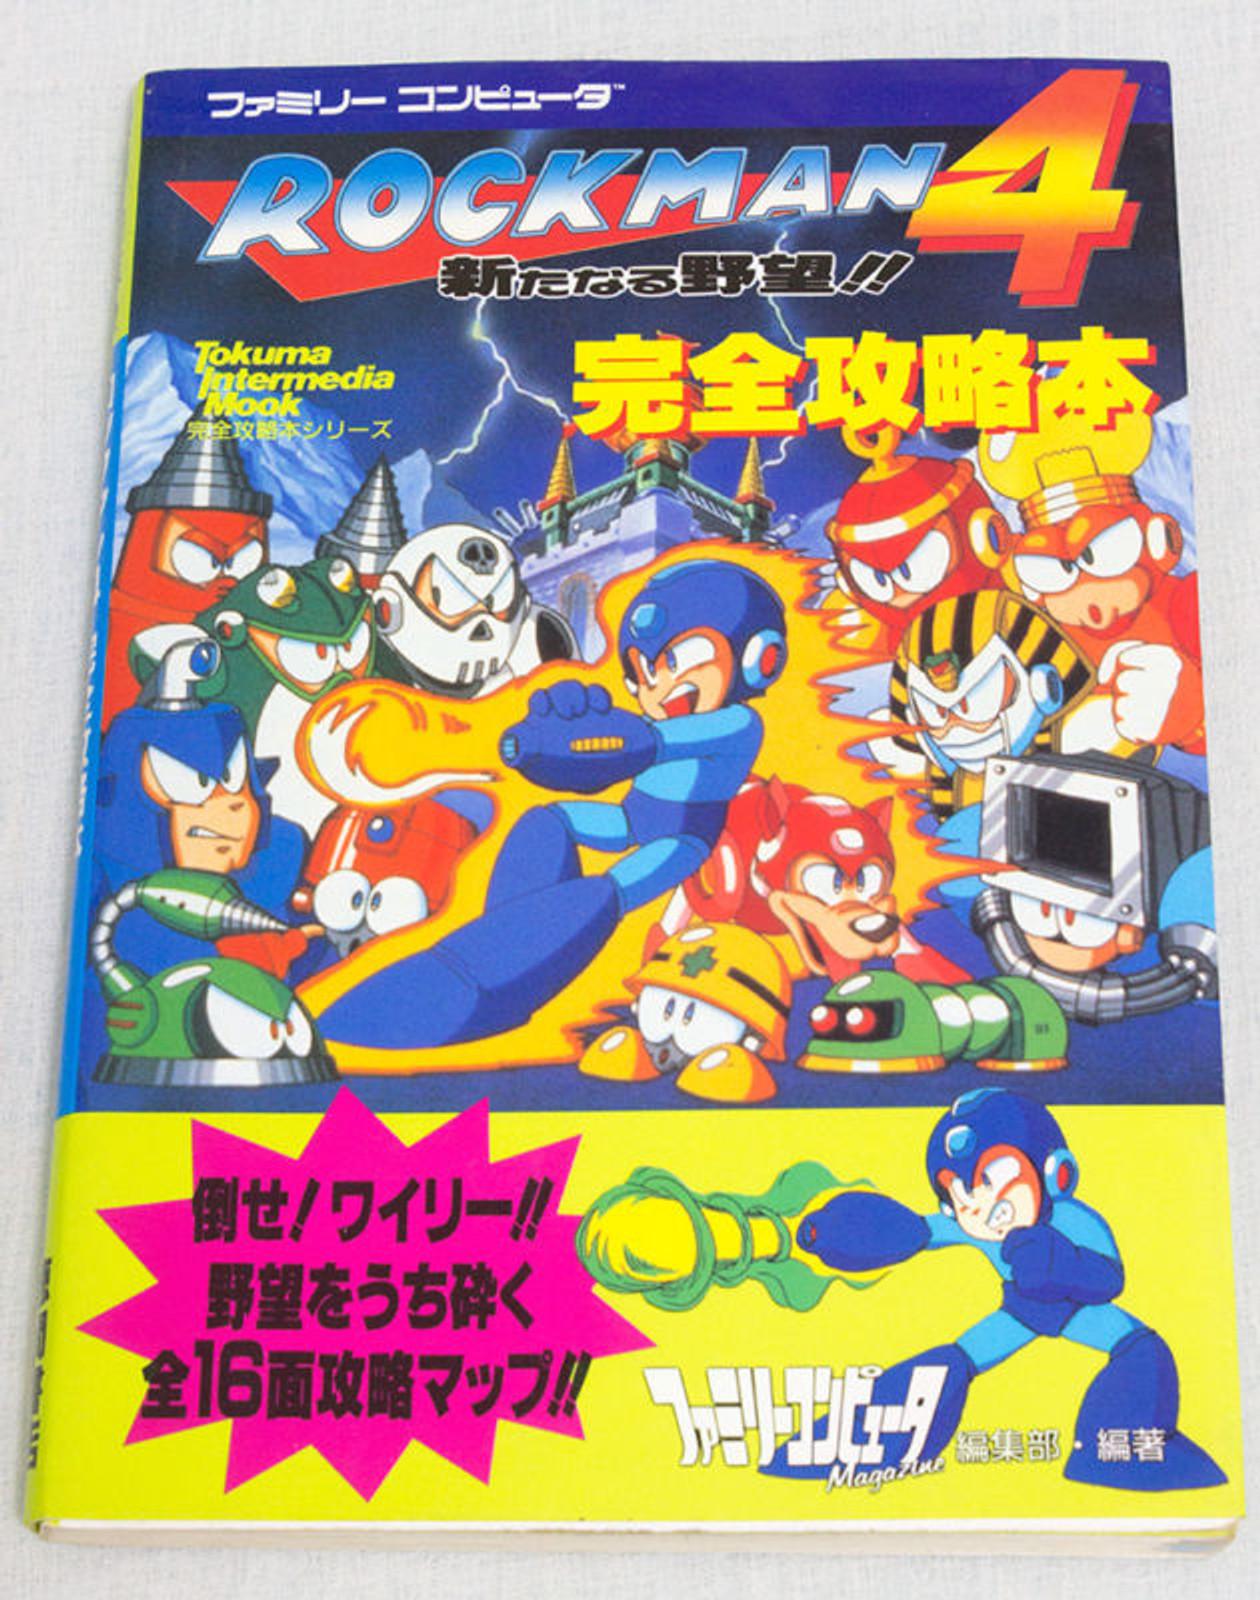 ROCKMAN 4 Mega man Complete Game Guide Book Japan Famicom NES